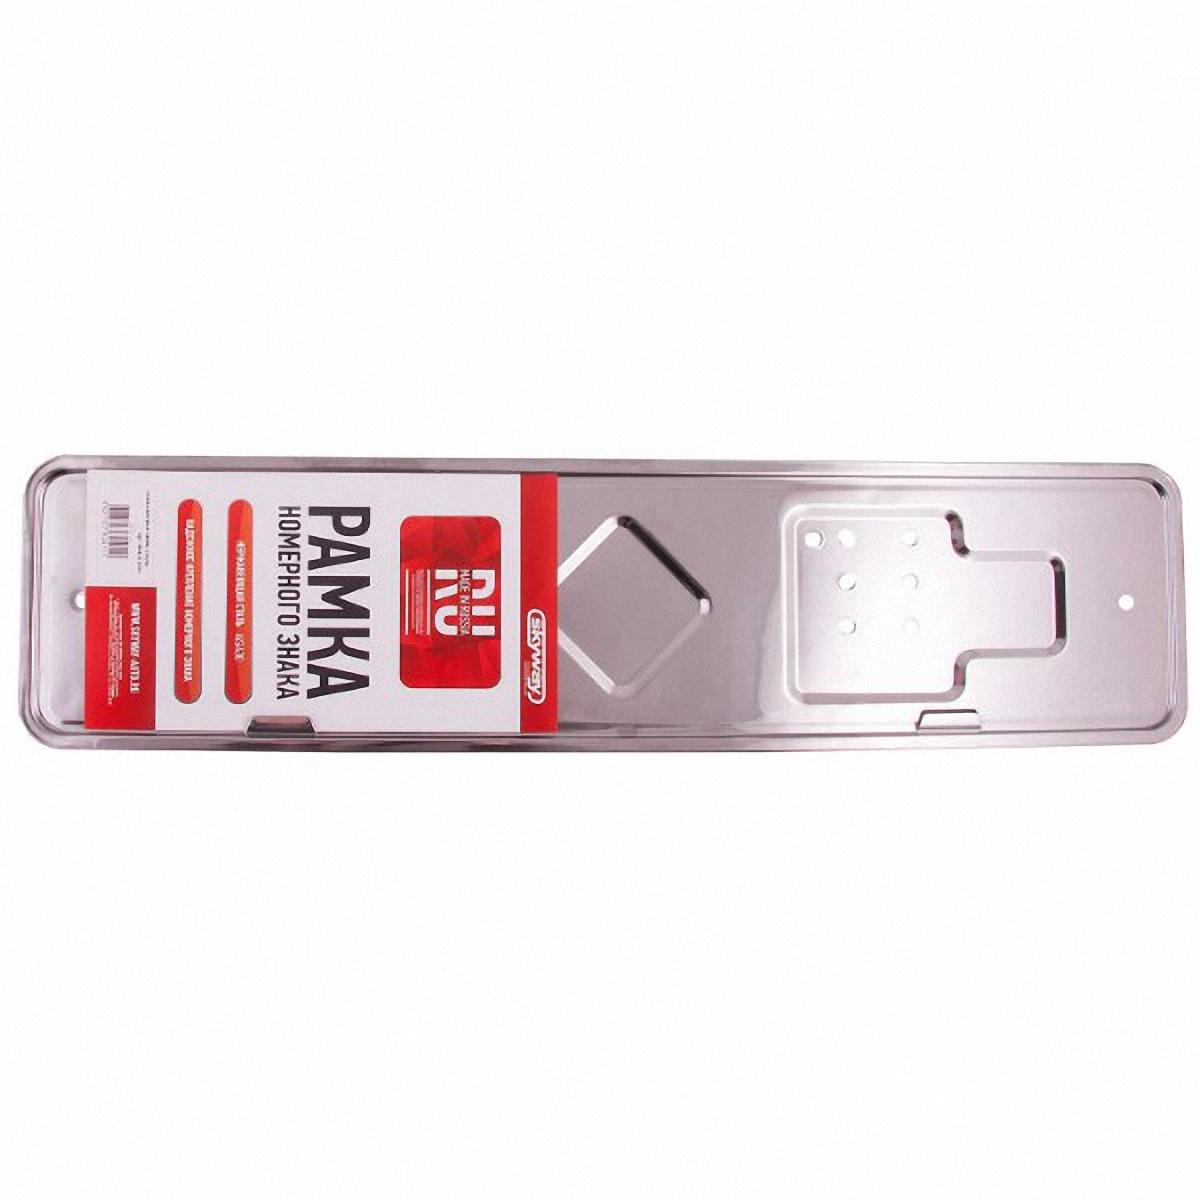 Рамка под номер Skyway, цвет: светло-серый рамка под номер skyway цвет серо белый